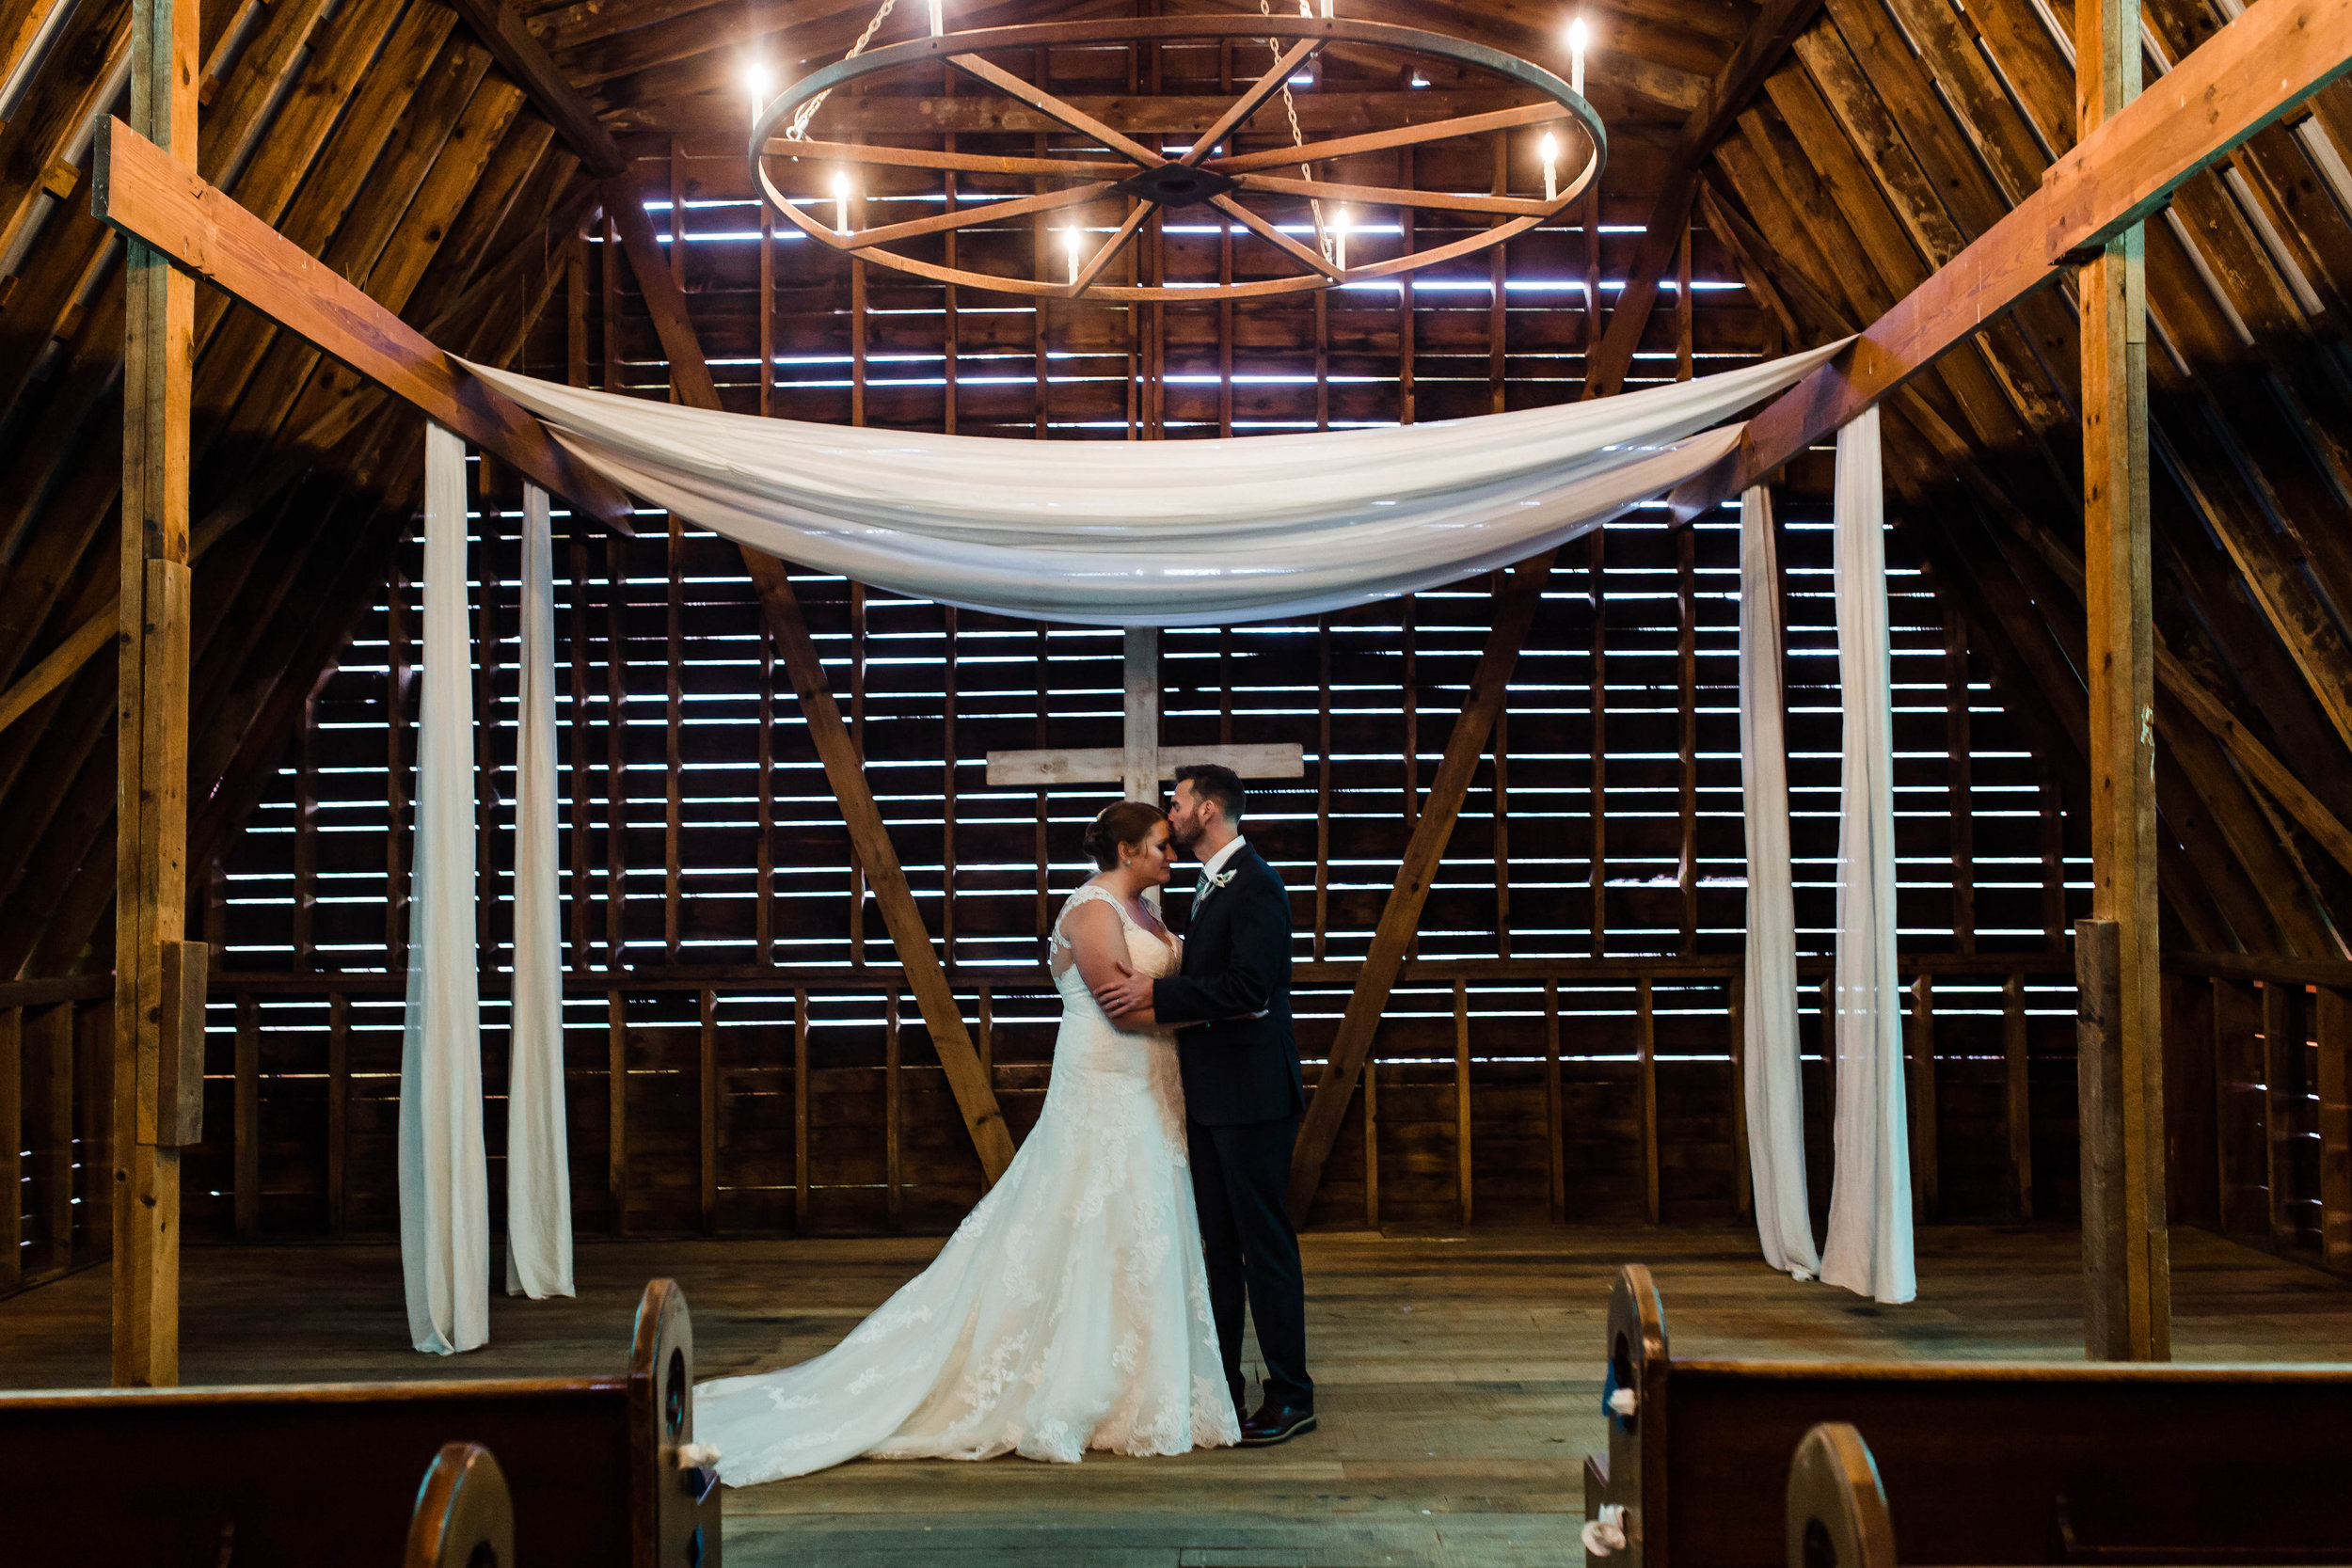 Honeysuckle-Hill-Weddings-Andrew-Rachel-213.jpg